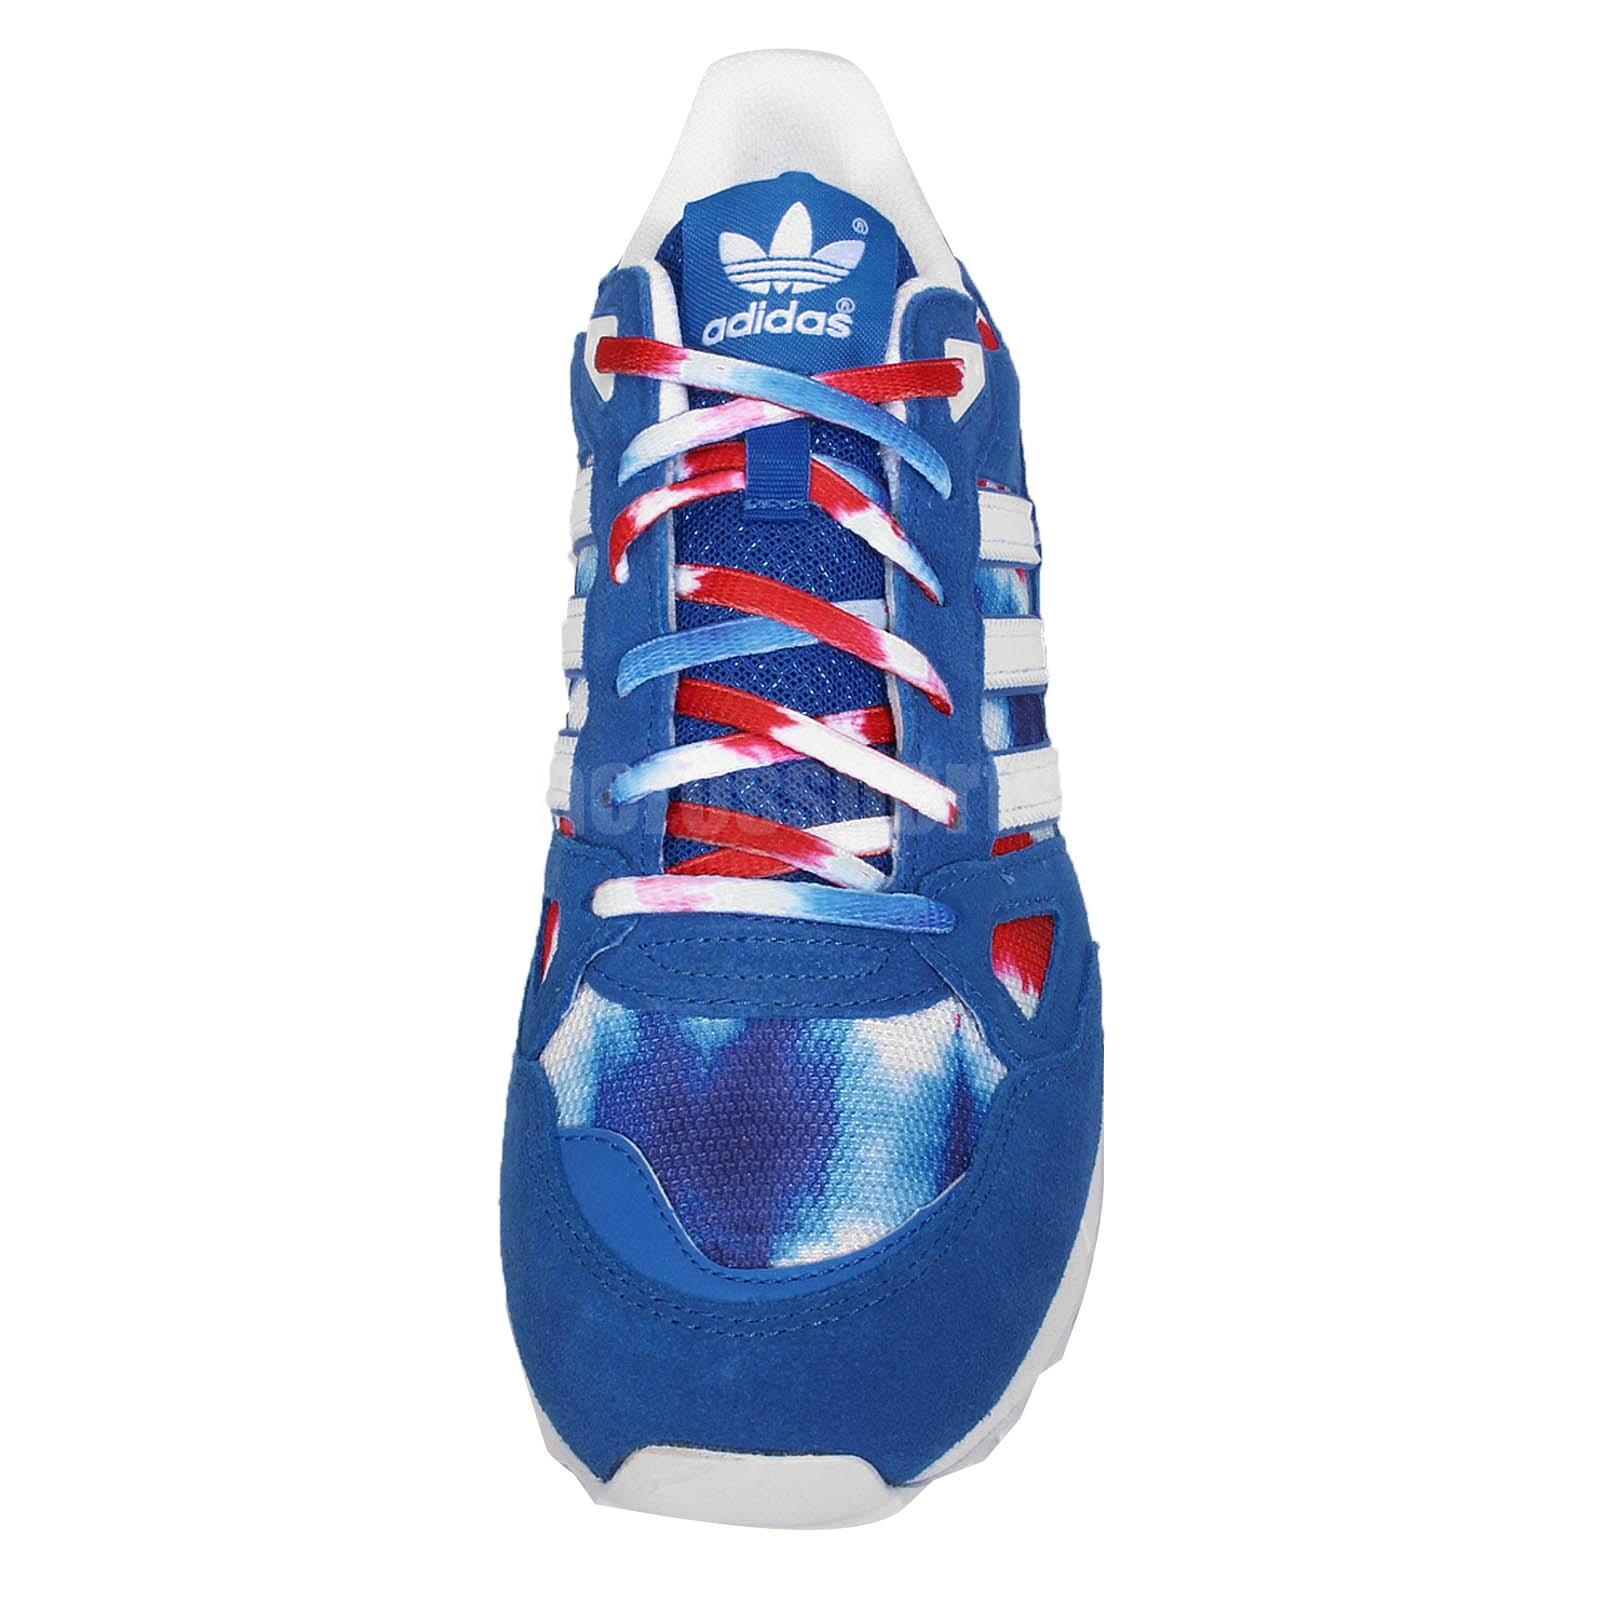 zx 750 adidas blue